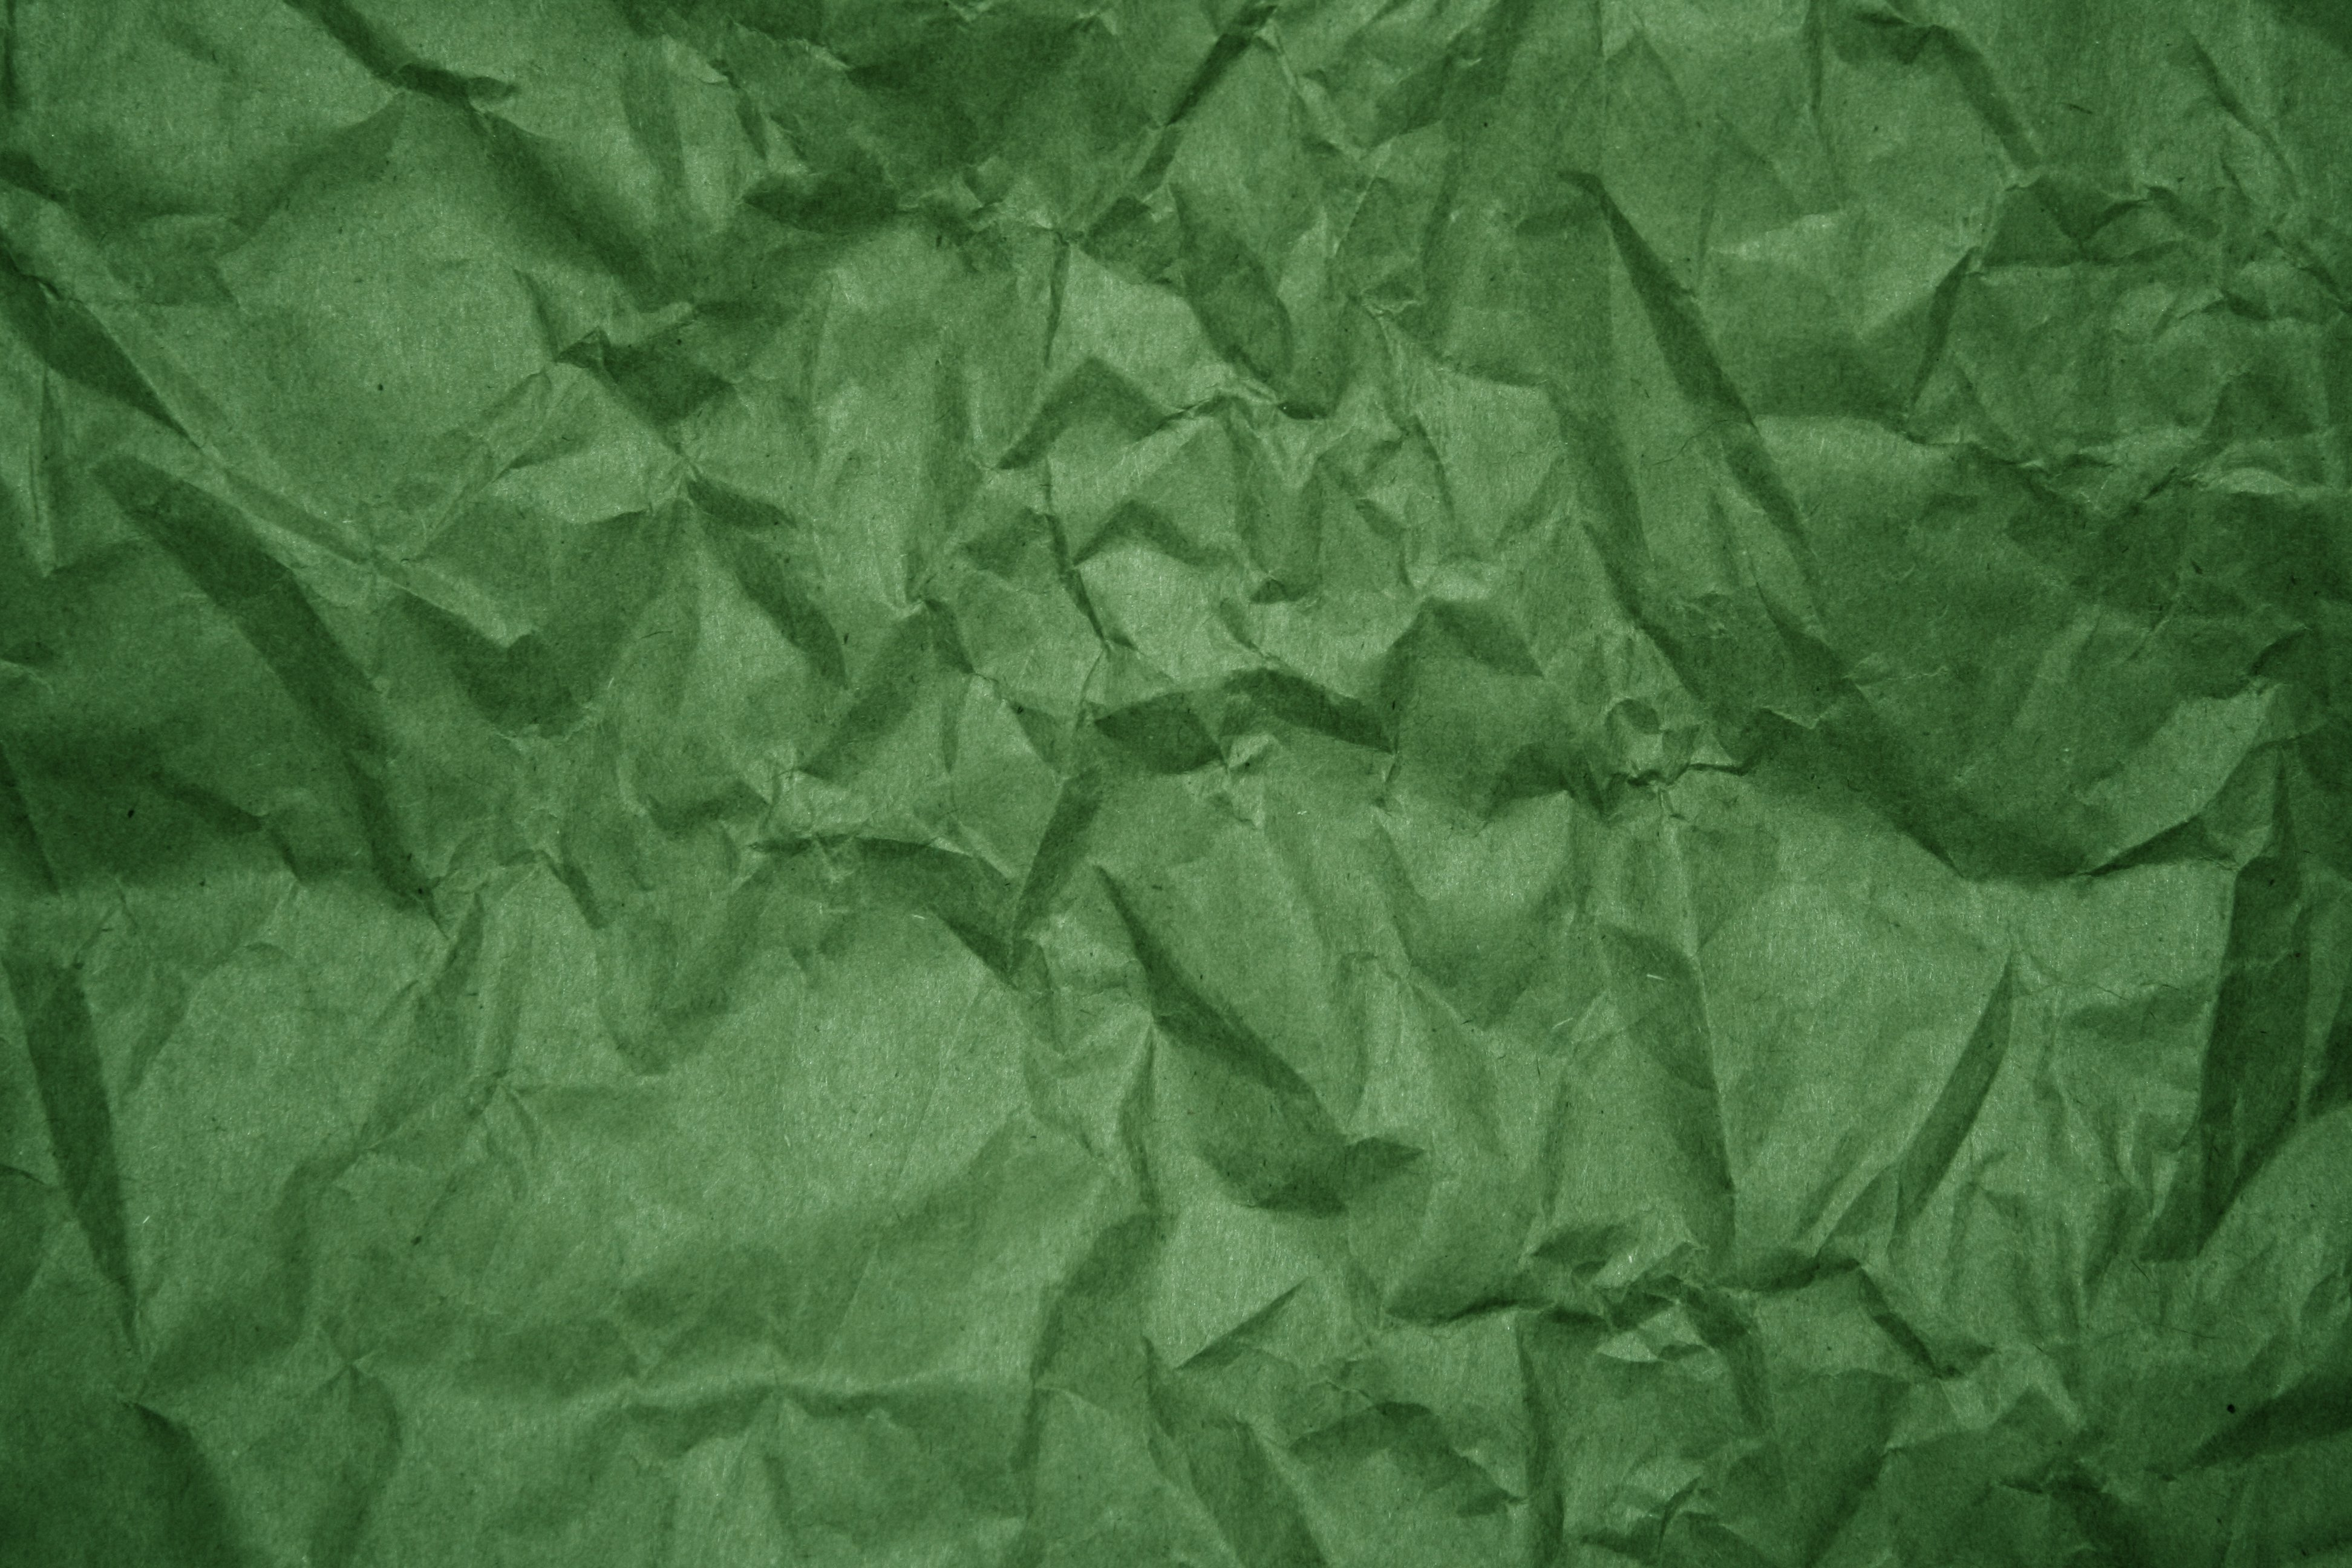 crumpled green paper texture photos public domain. Black Bedroom Furniture Sets. Home Design Ideas